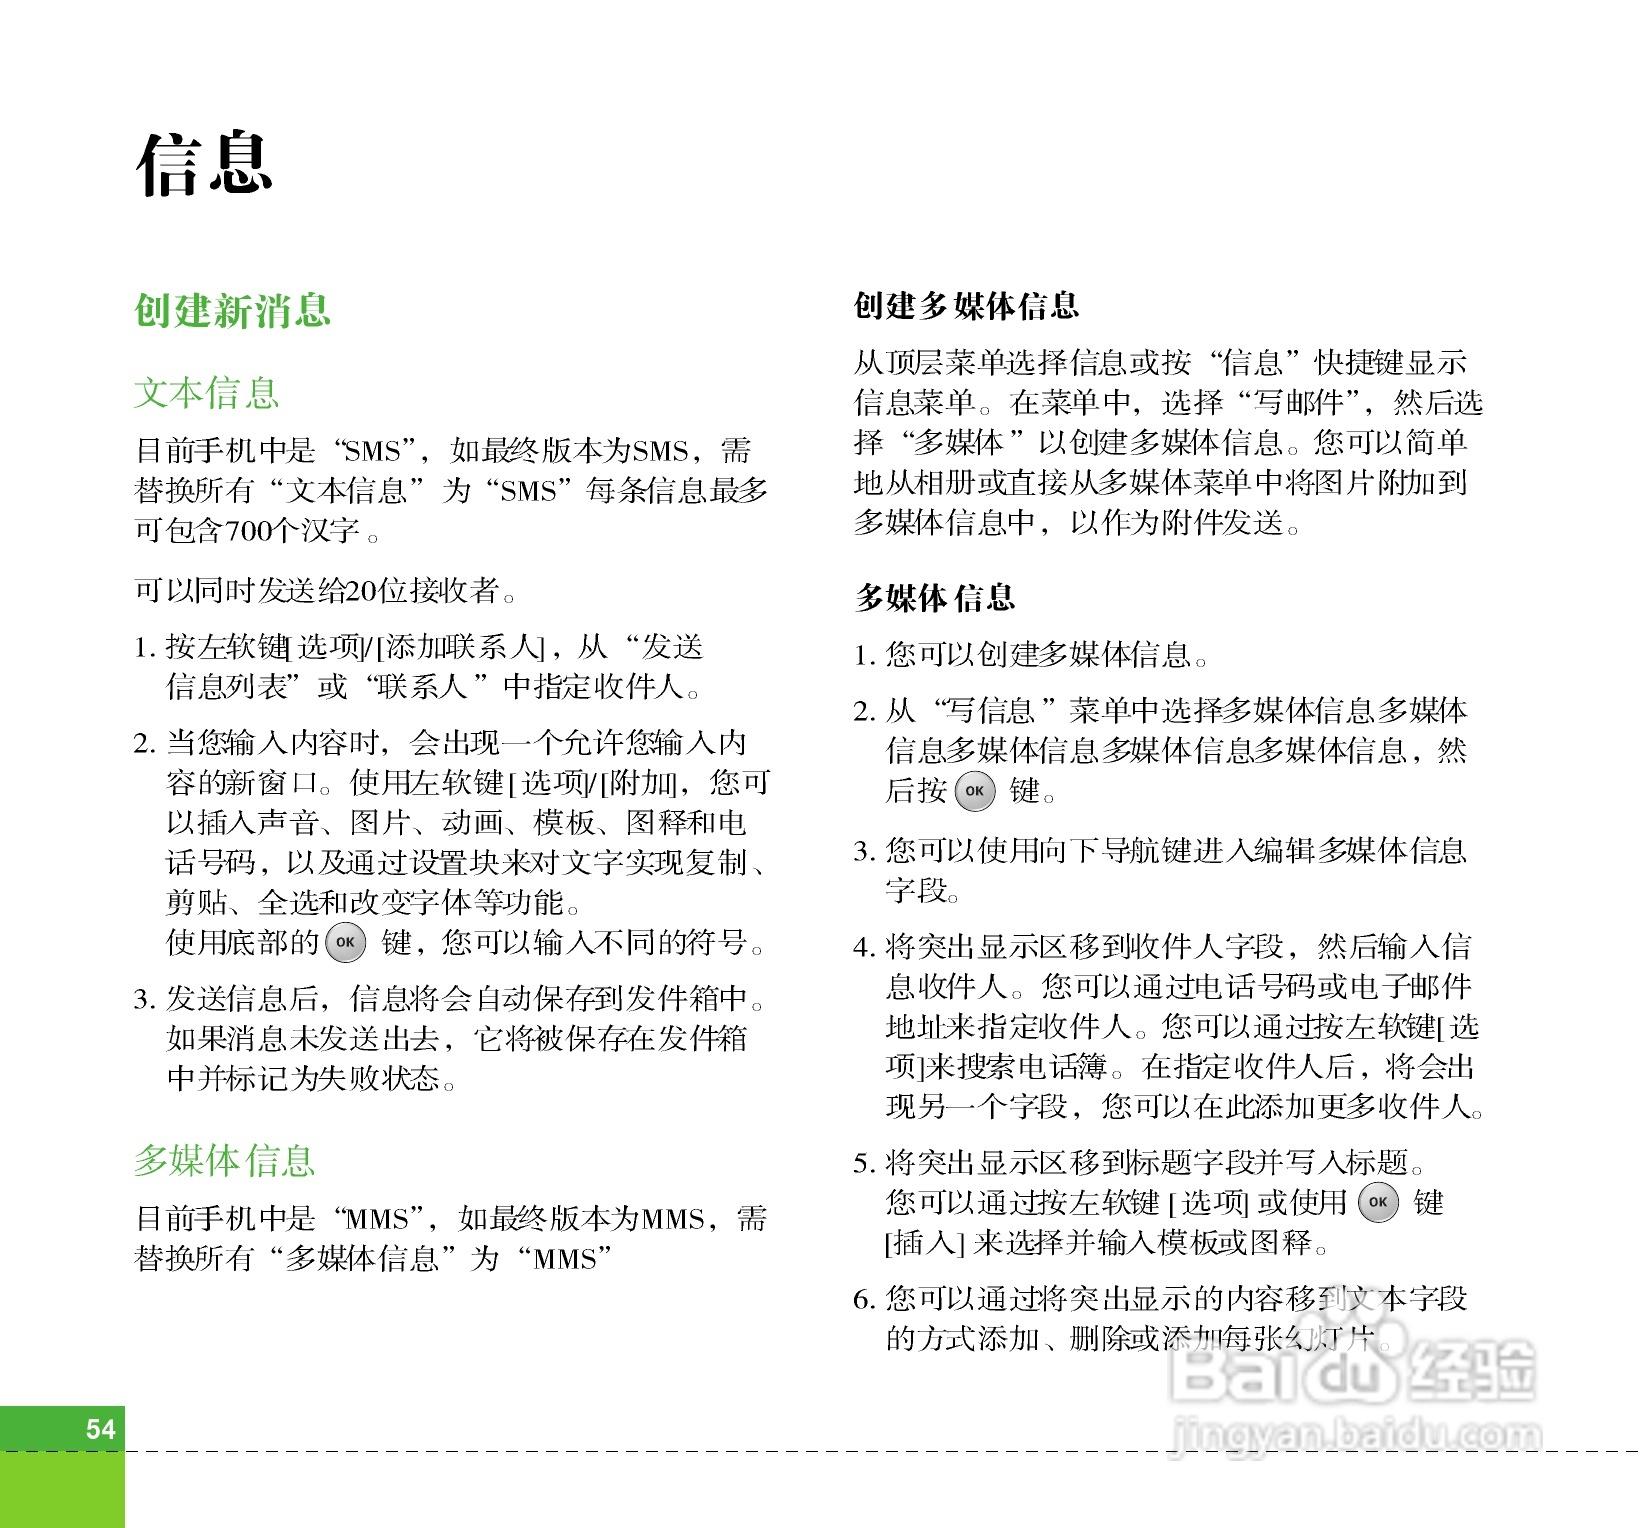 lg手機使用說明書 貴溪【南京淘汰中央空調回收】☆收購服務☆